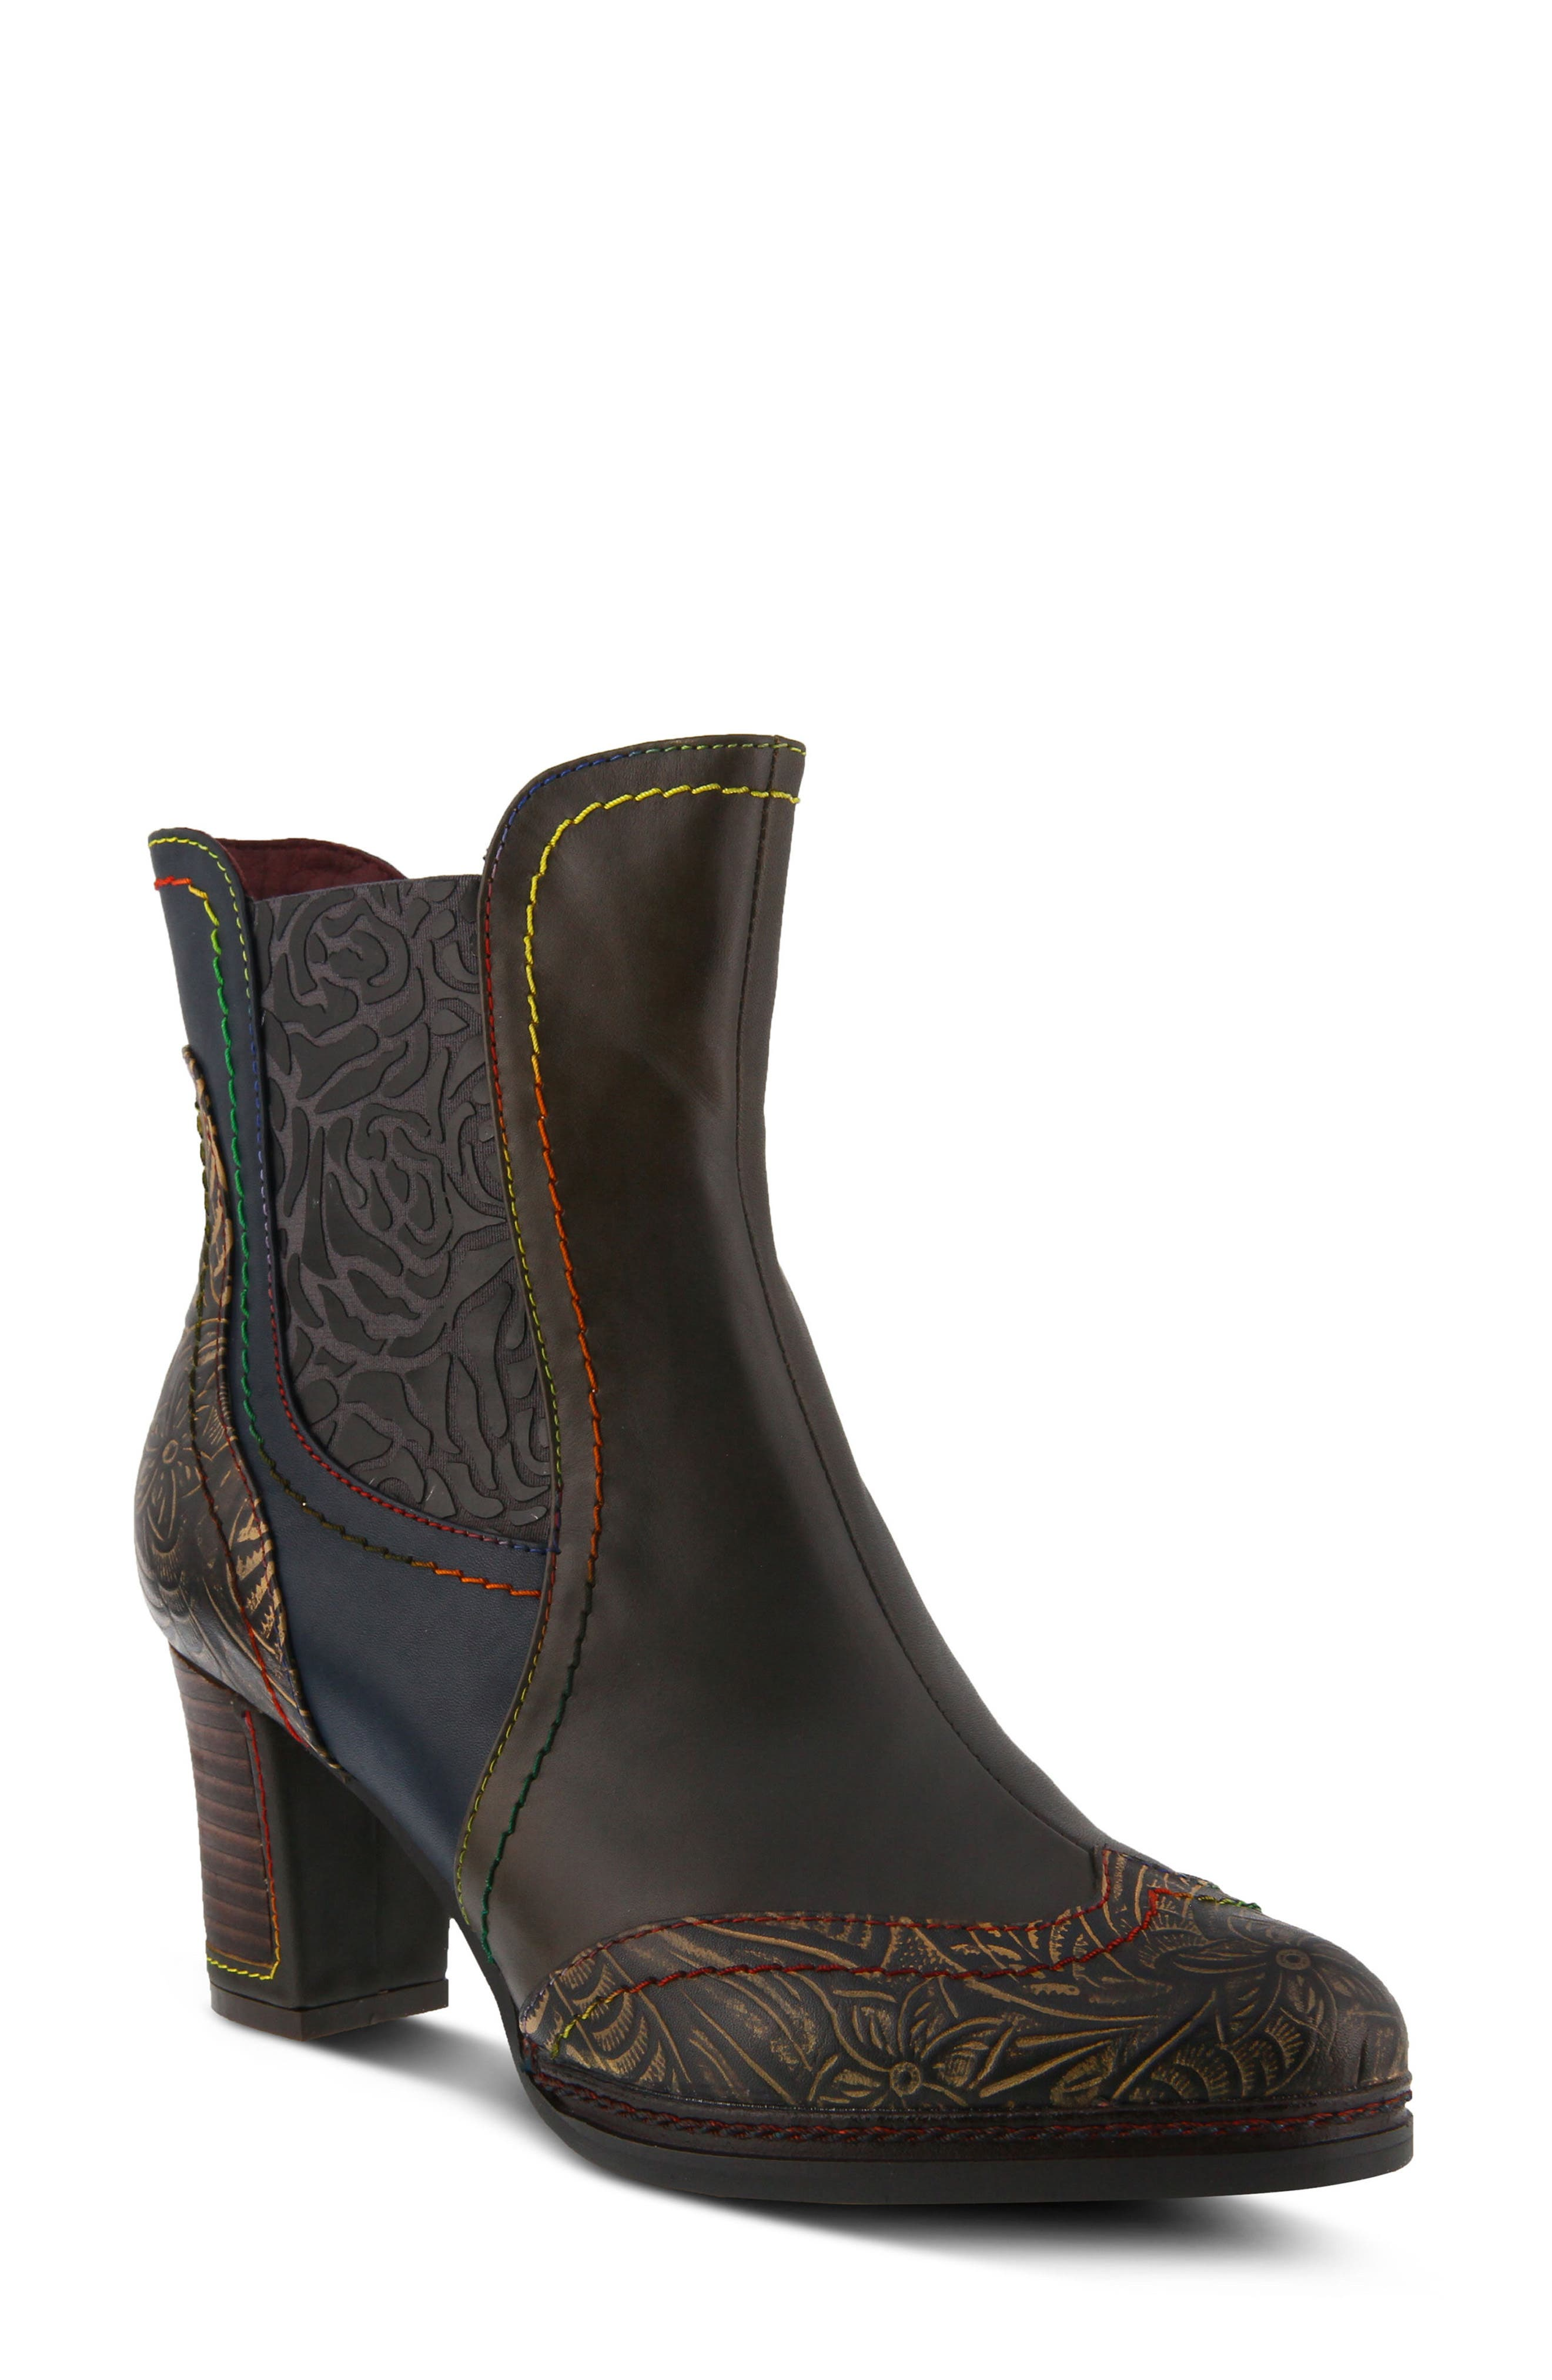 L'Artiste Santana Boot,                             Main thumbnail 1, color,                             Olive Green Leather